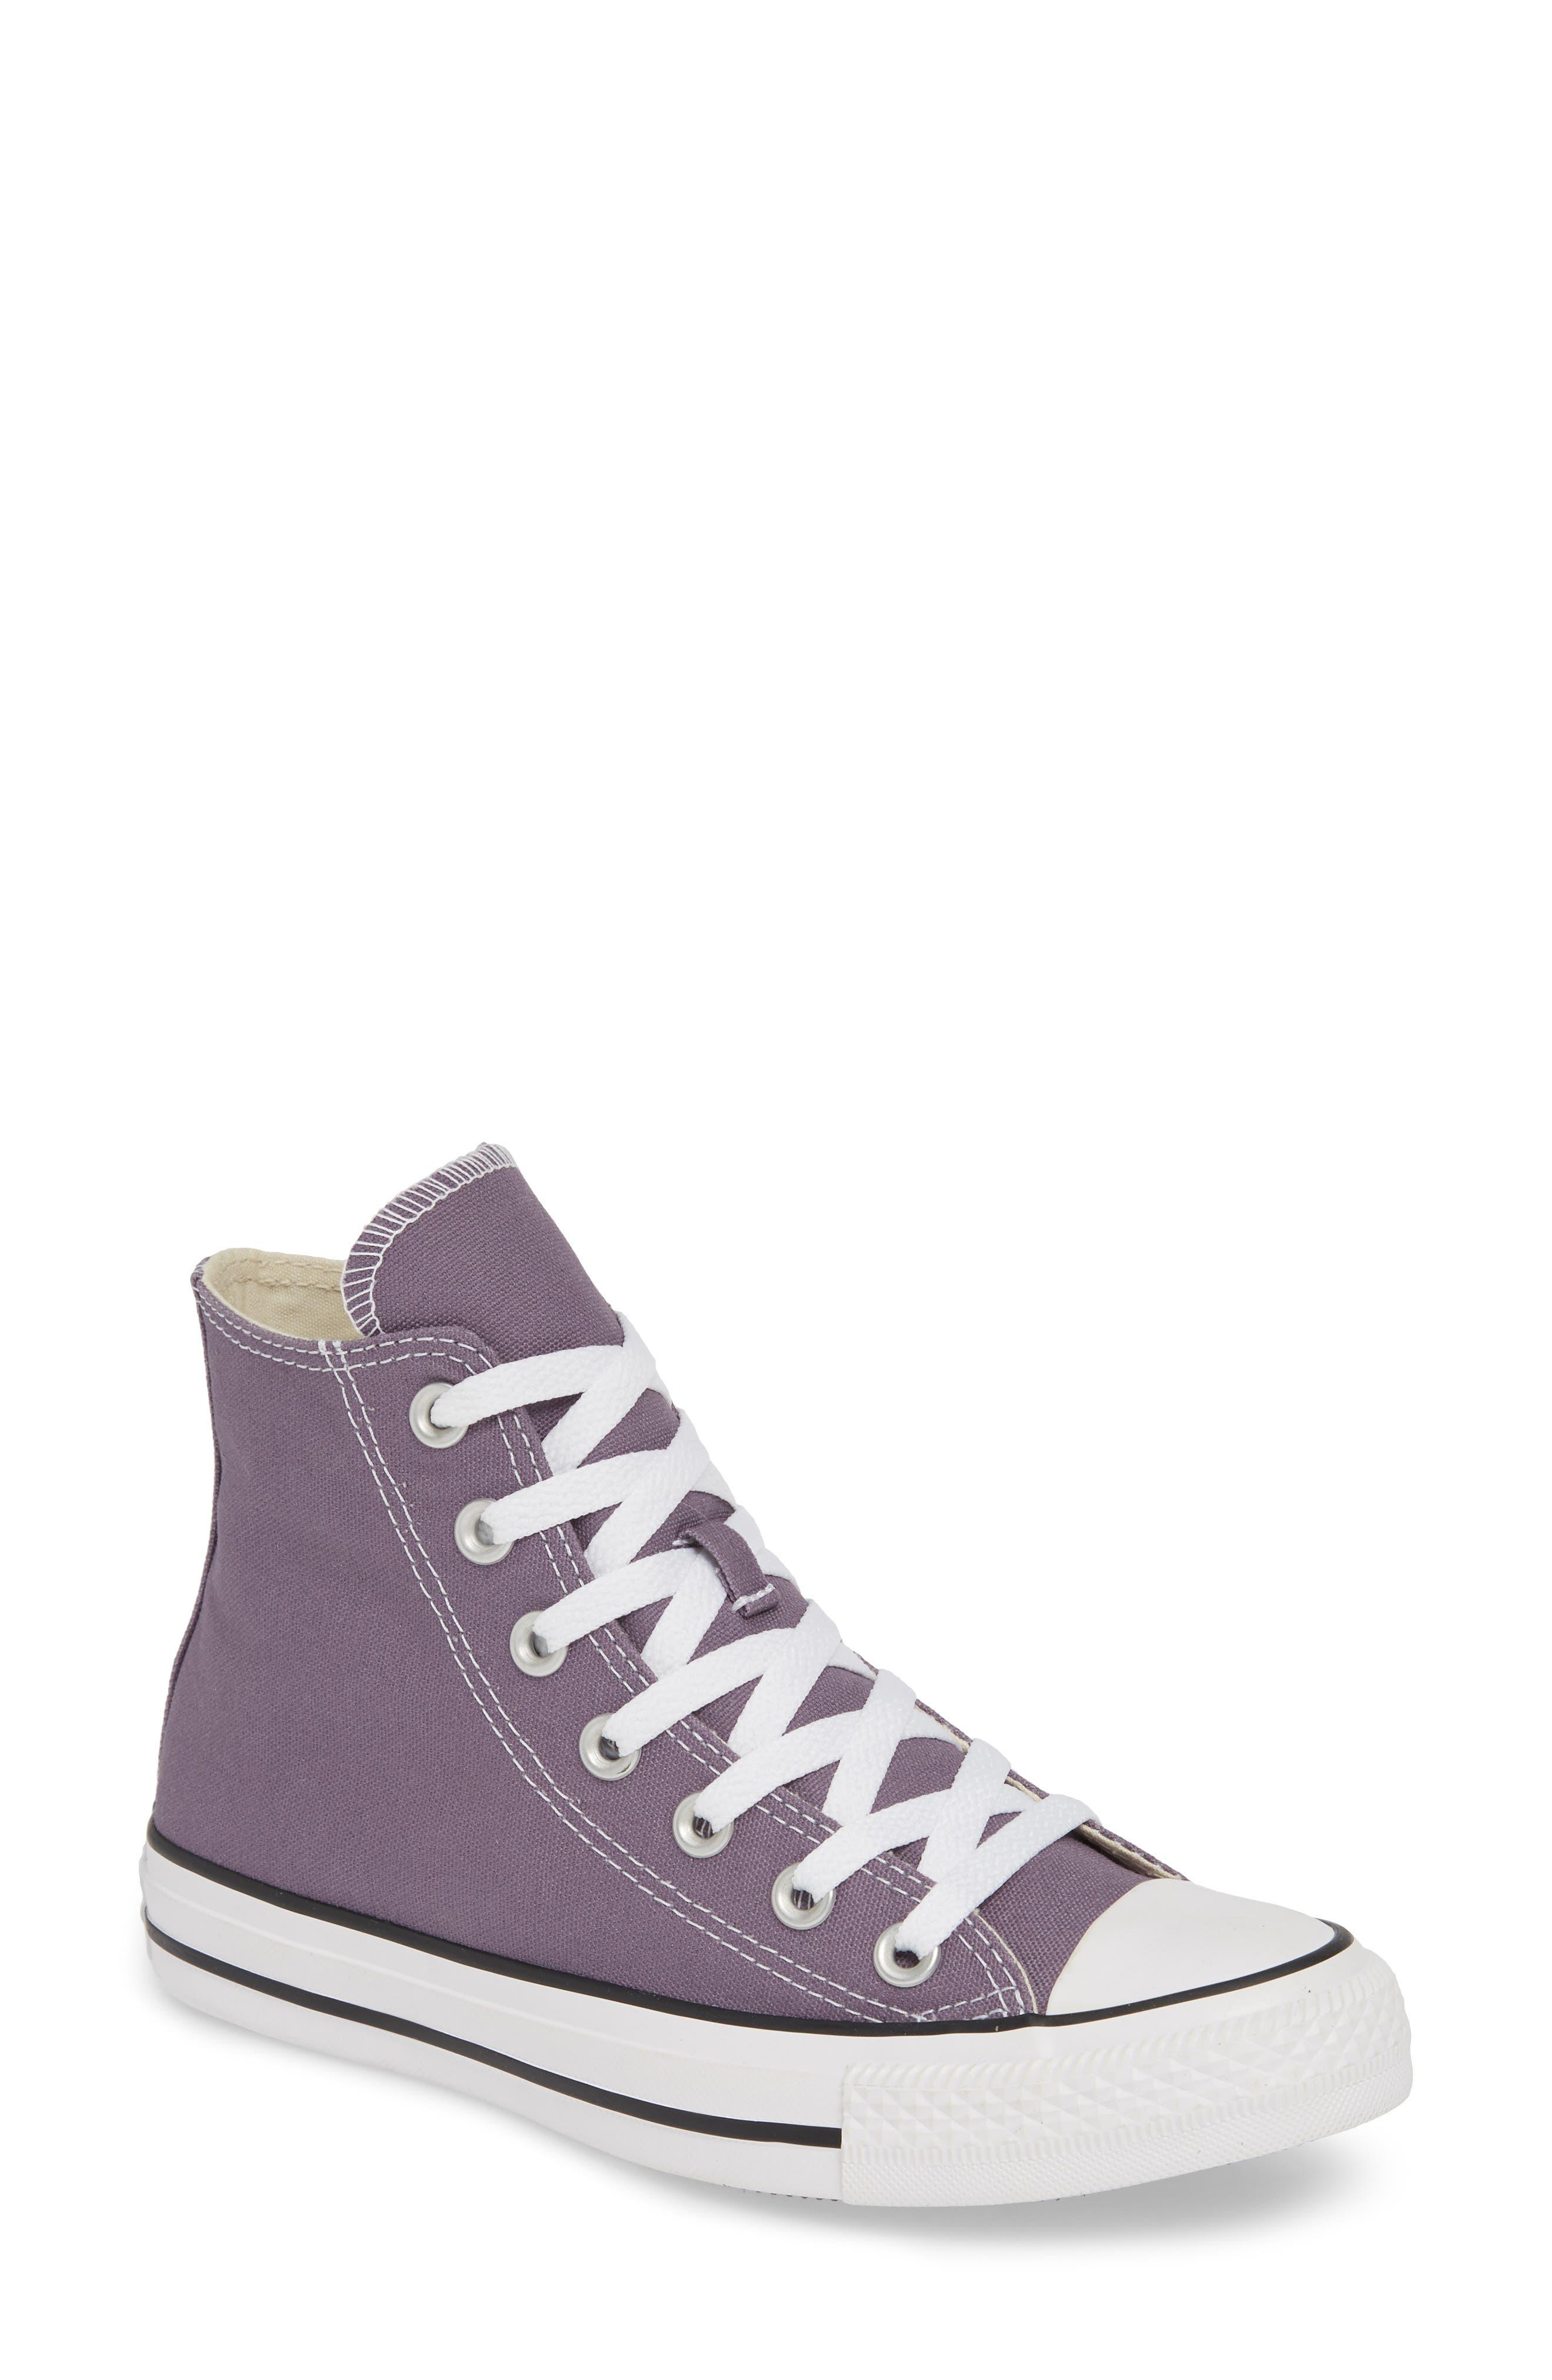 Converse Chuck Taylor All Star High Top Sneaker- Purple